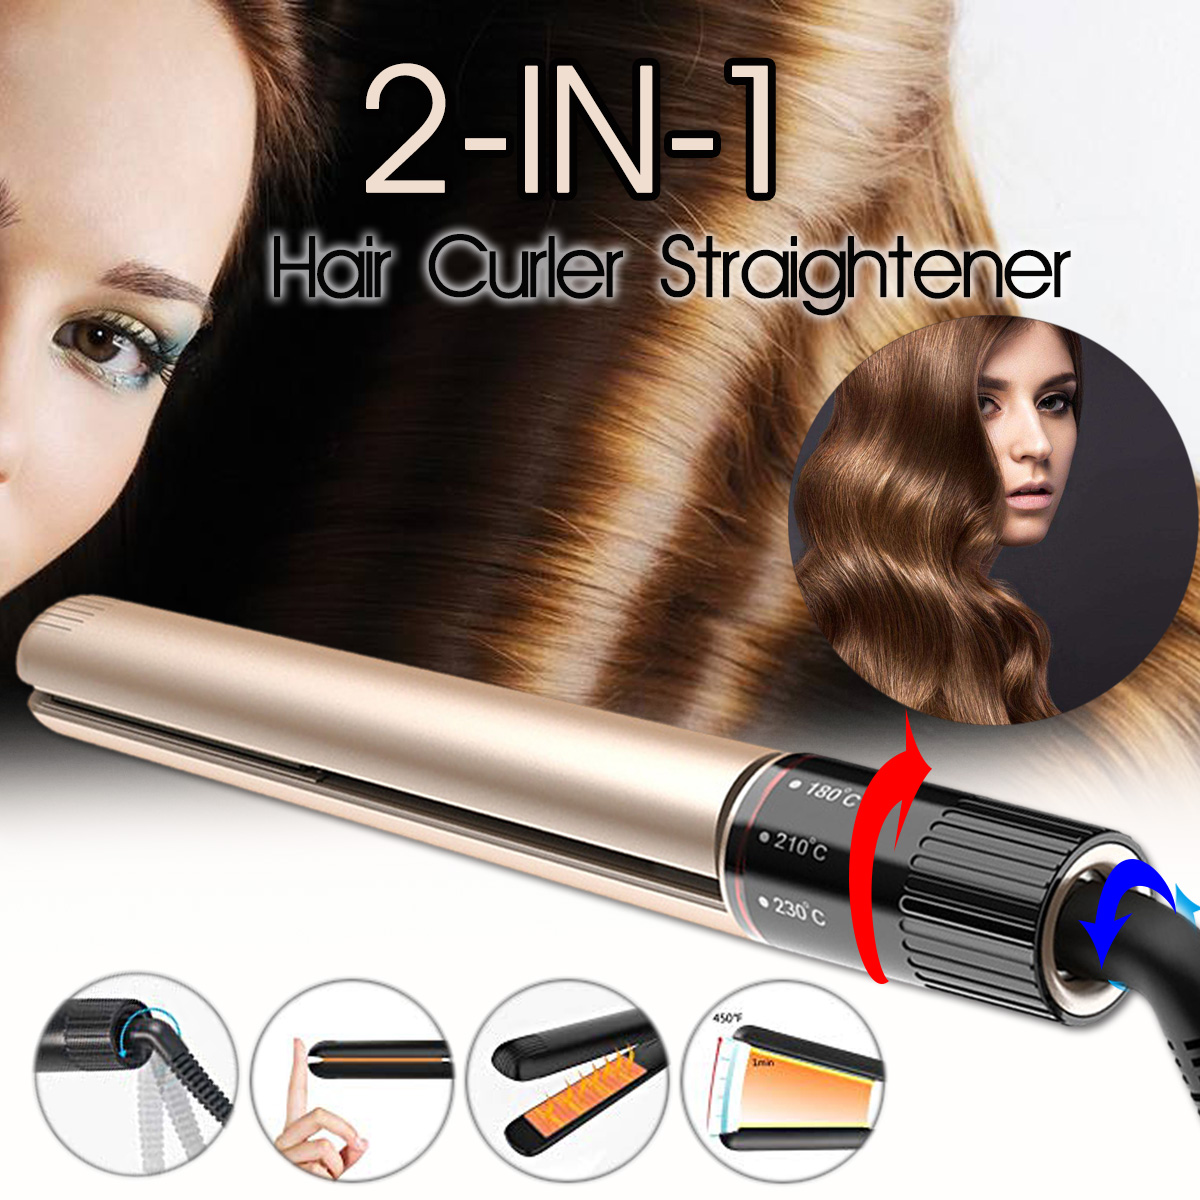 Kemei Hair Straightener Curler 2-IN-1 Rotating Adjustment Pr